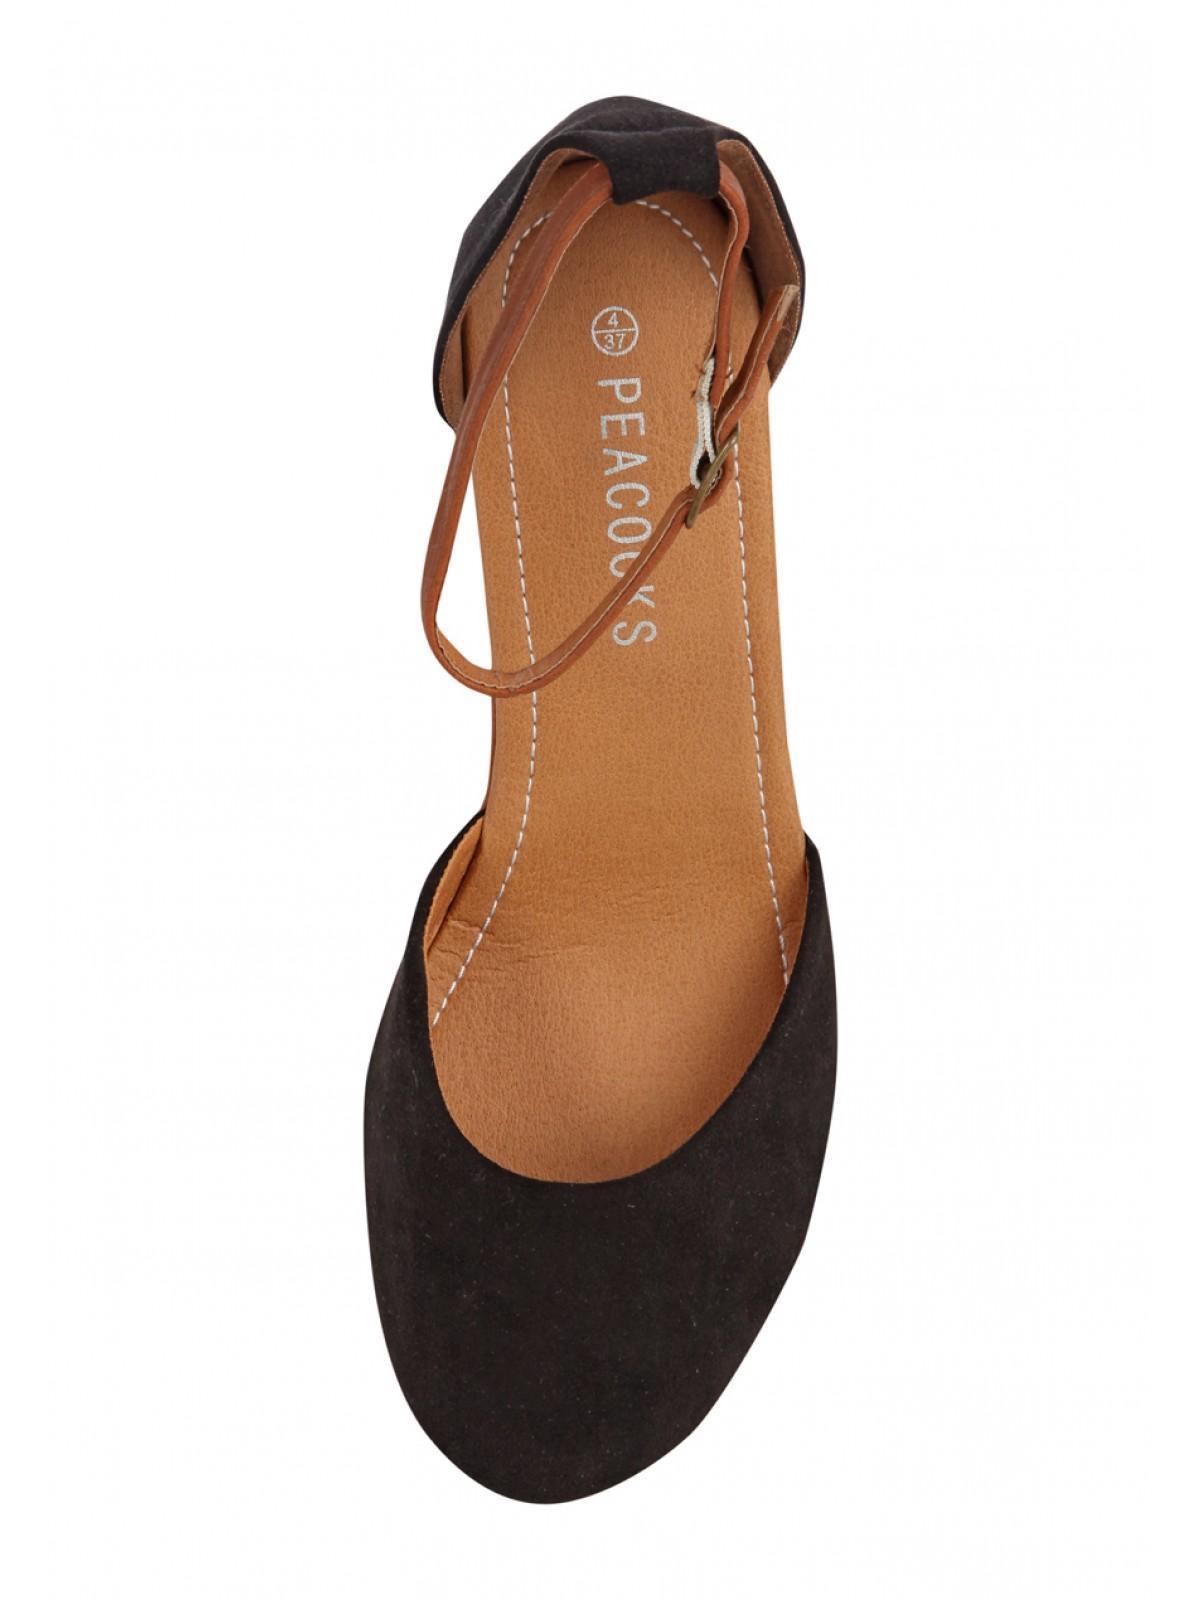 Black enclosed sandals - Previousnext Zoom